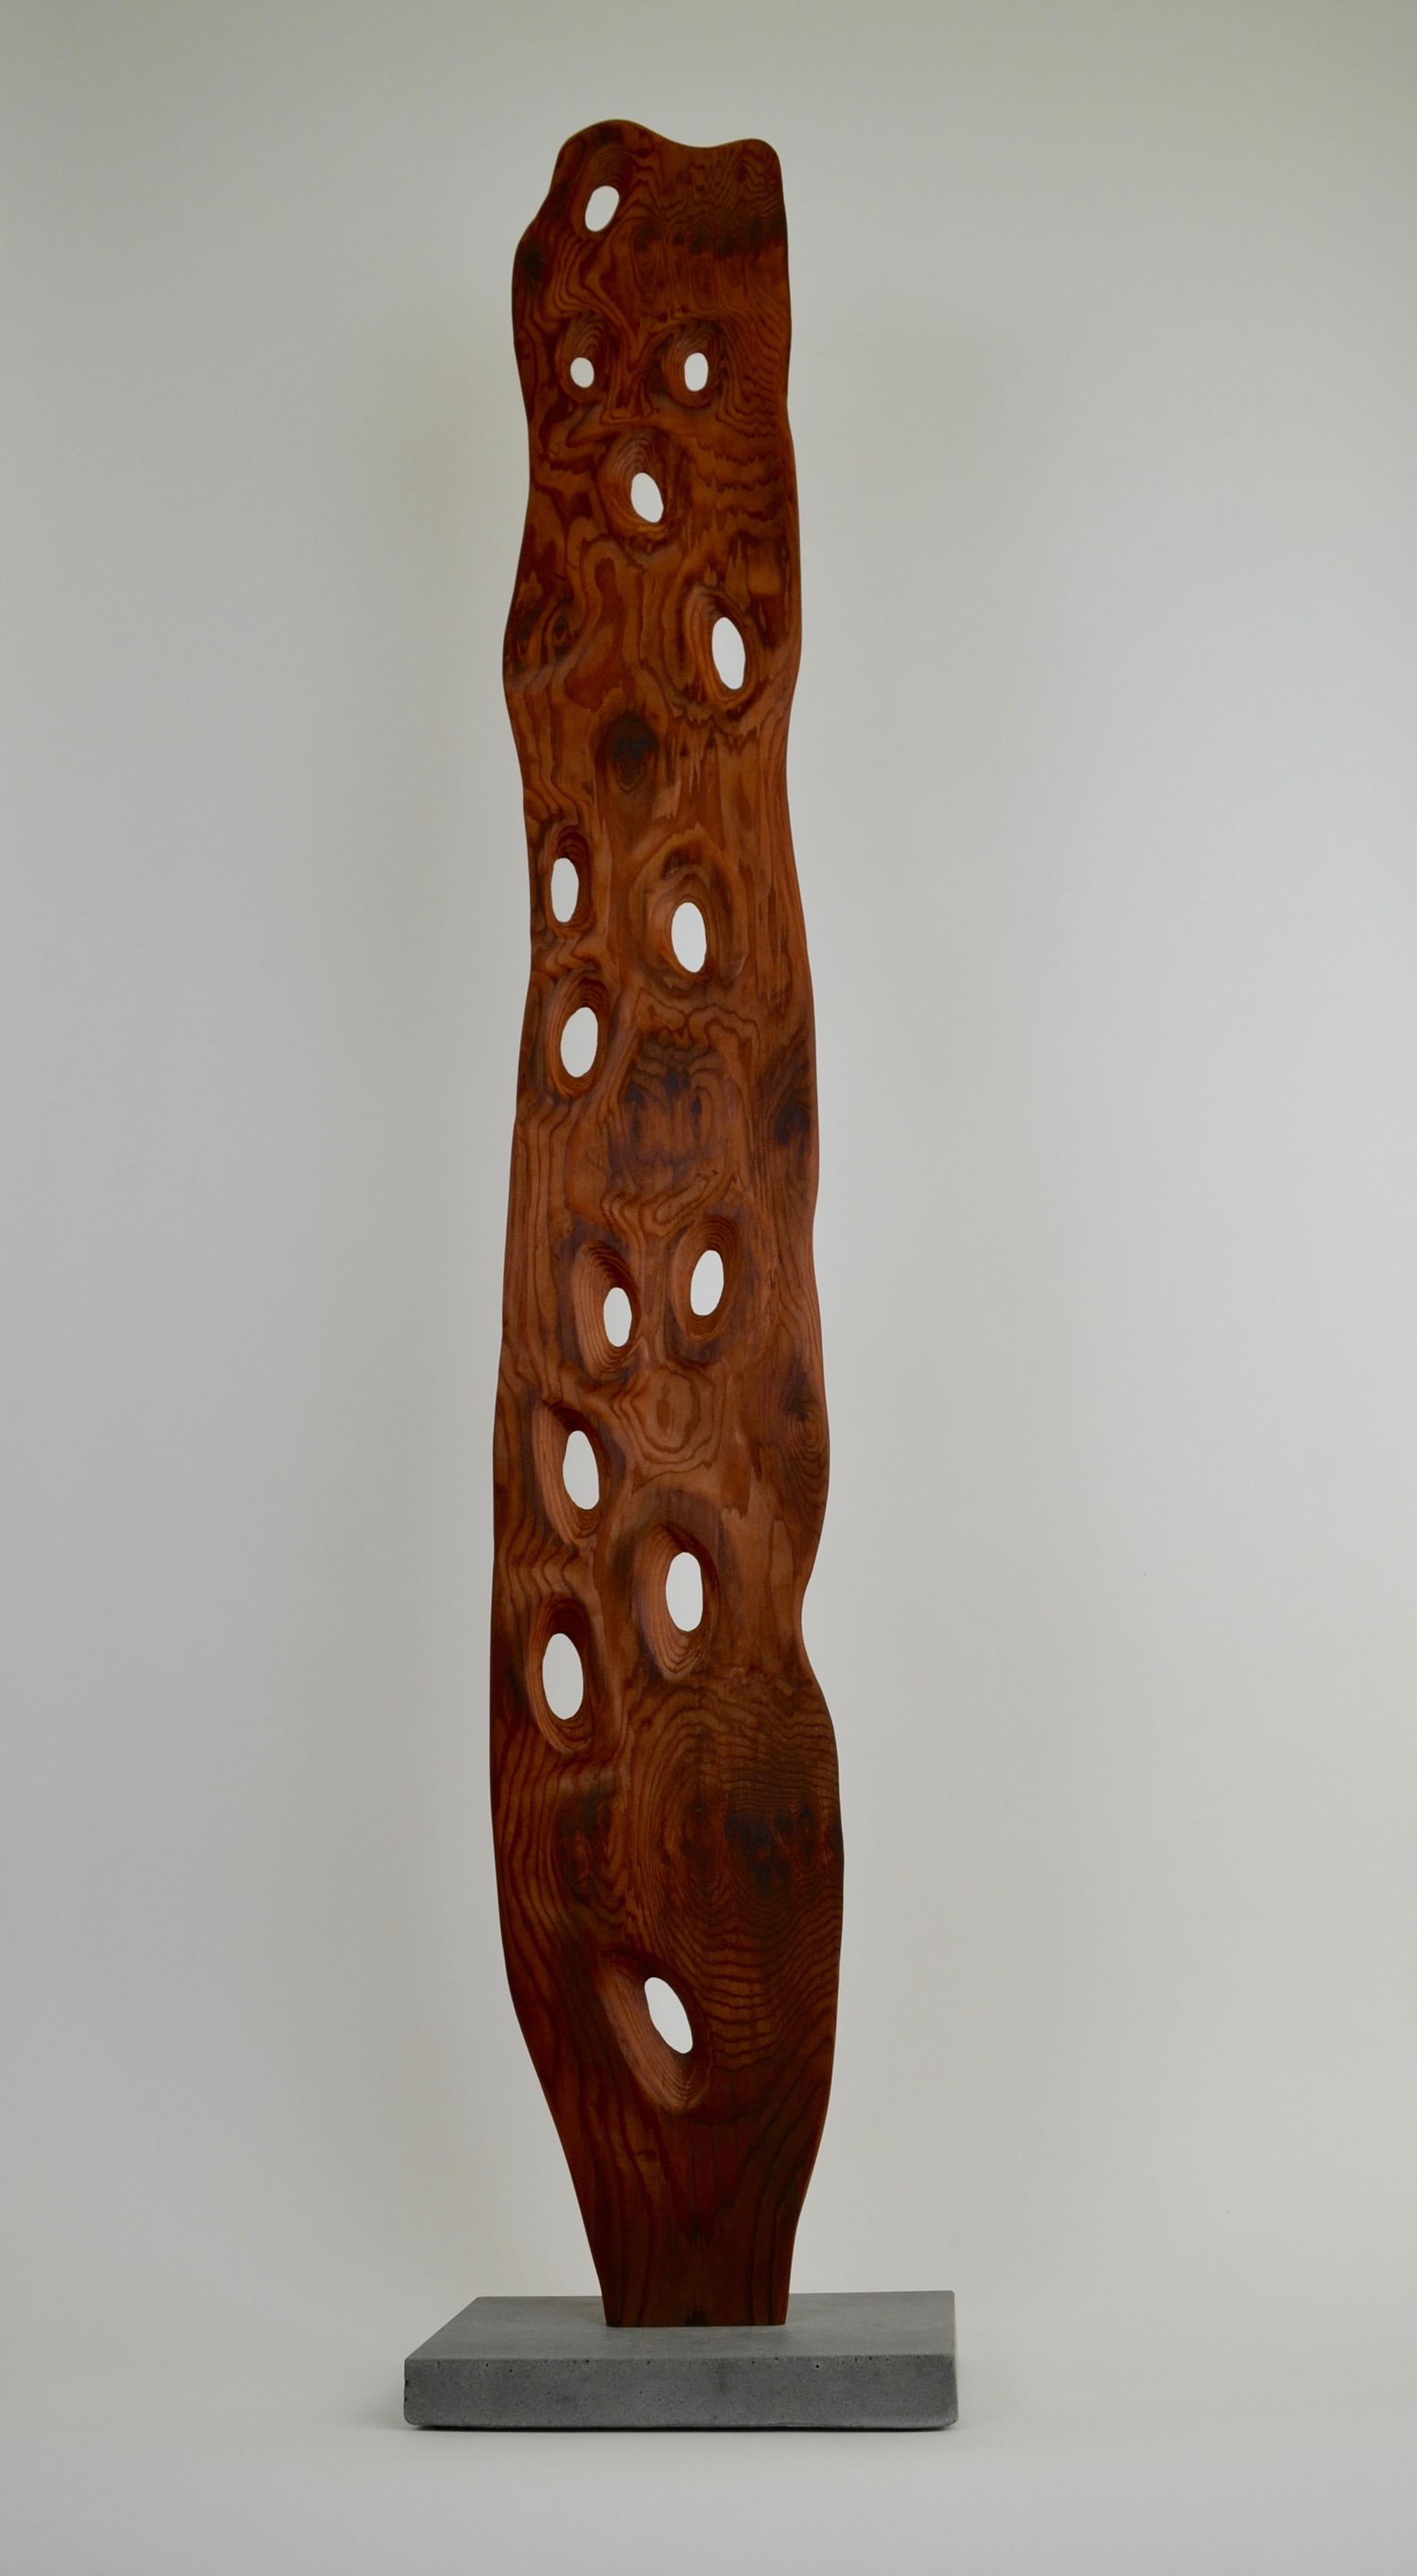 Abstract Wood Art : abstract, Abstract, Sculptures, Original, Artwork, Reclaimed, Design